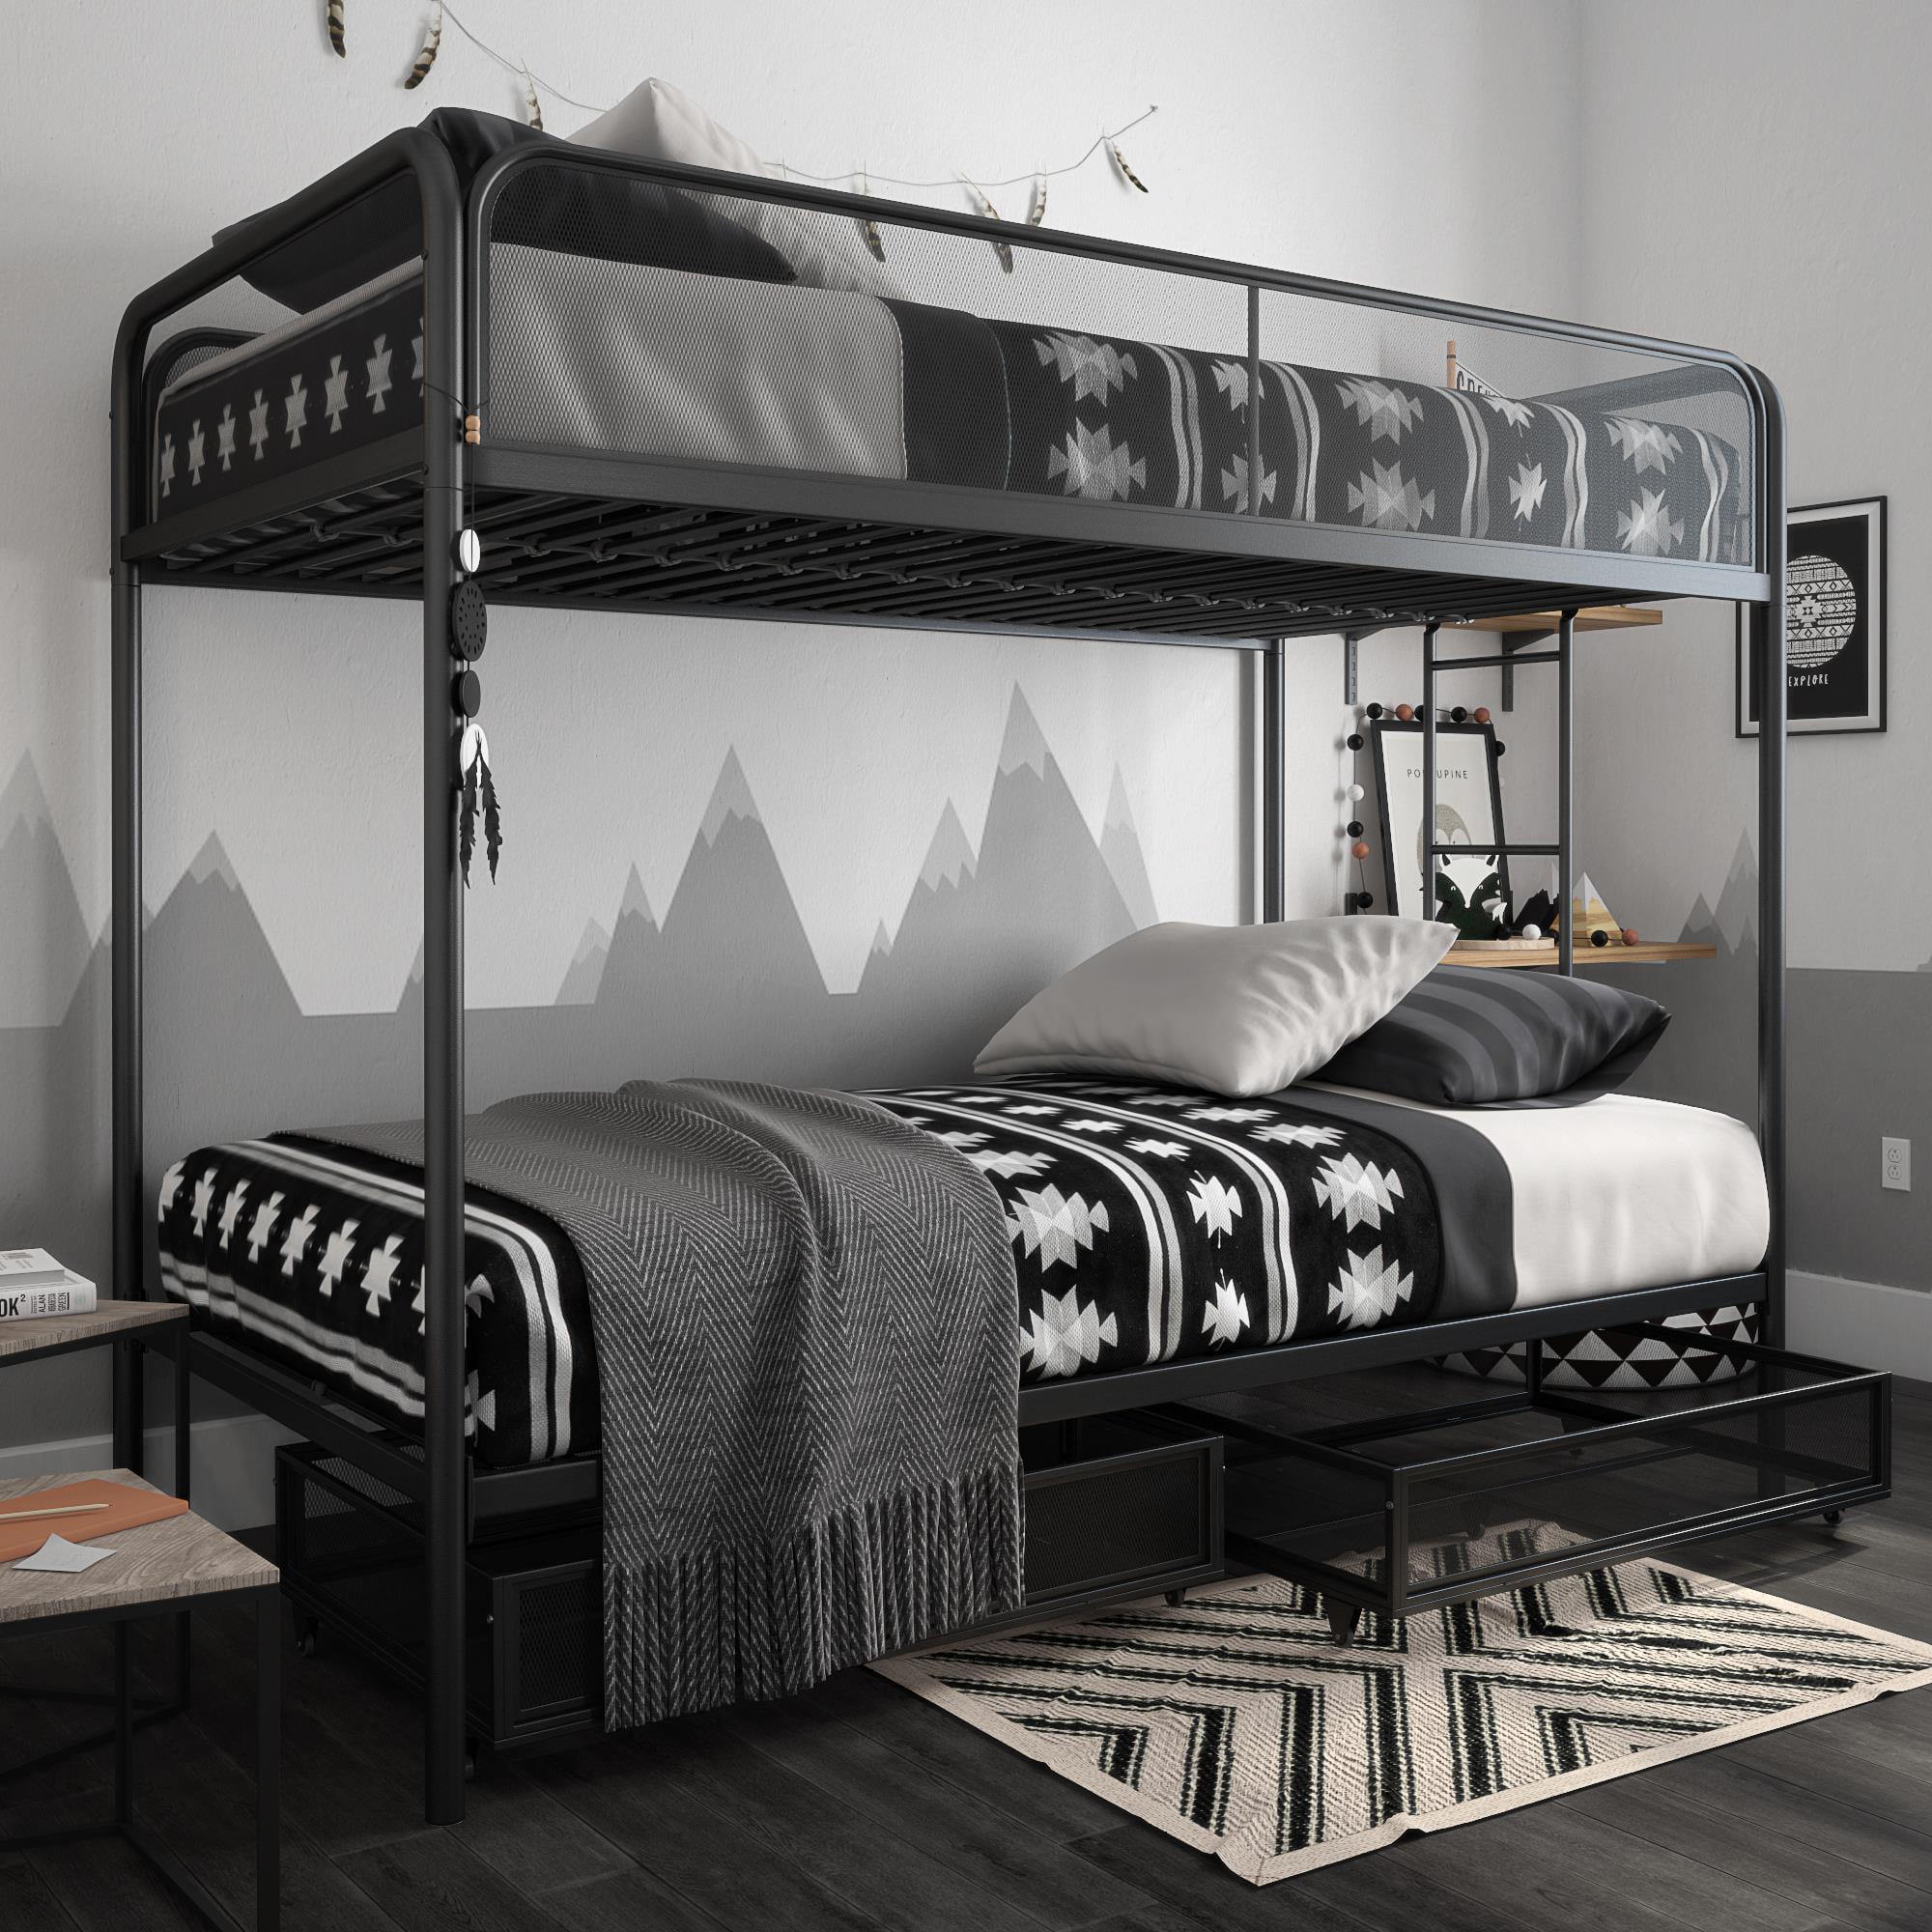 Picture of: Dhp Jaxon Twin Twin Bunk Bed With Storage Black Metal Walmart Com Walmart Com